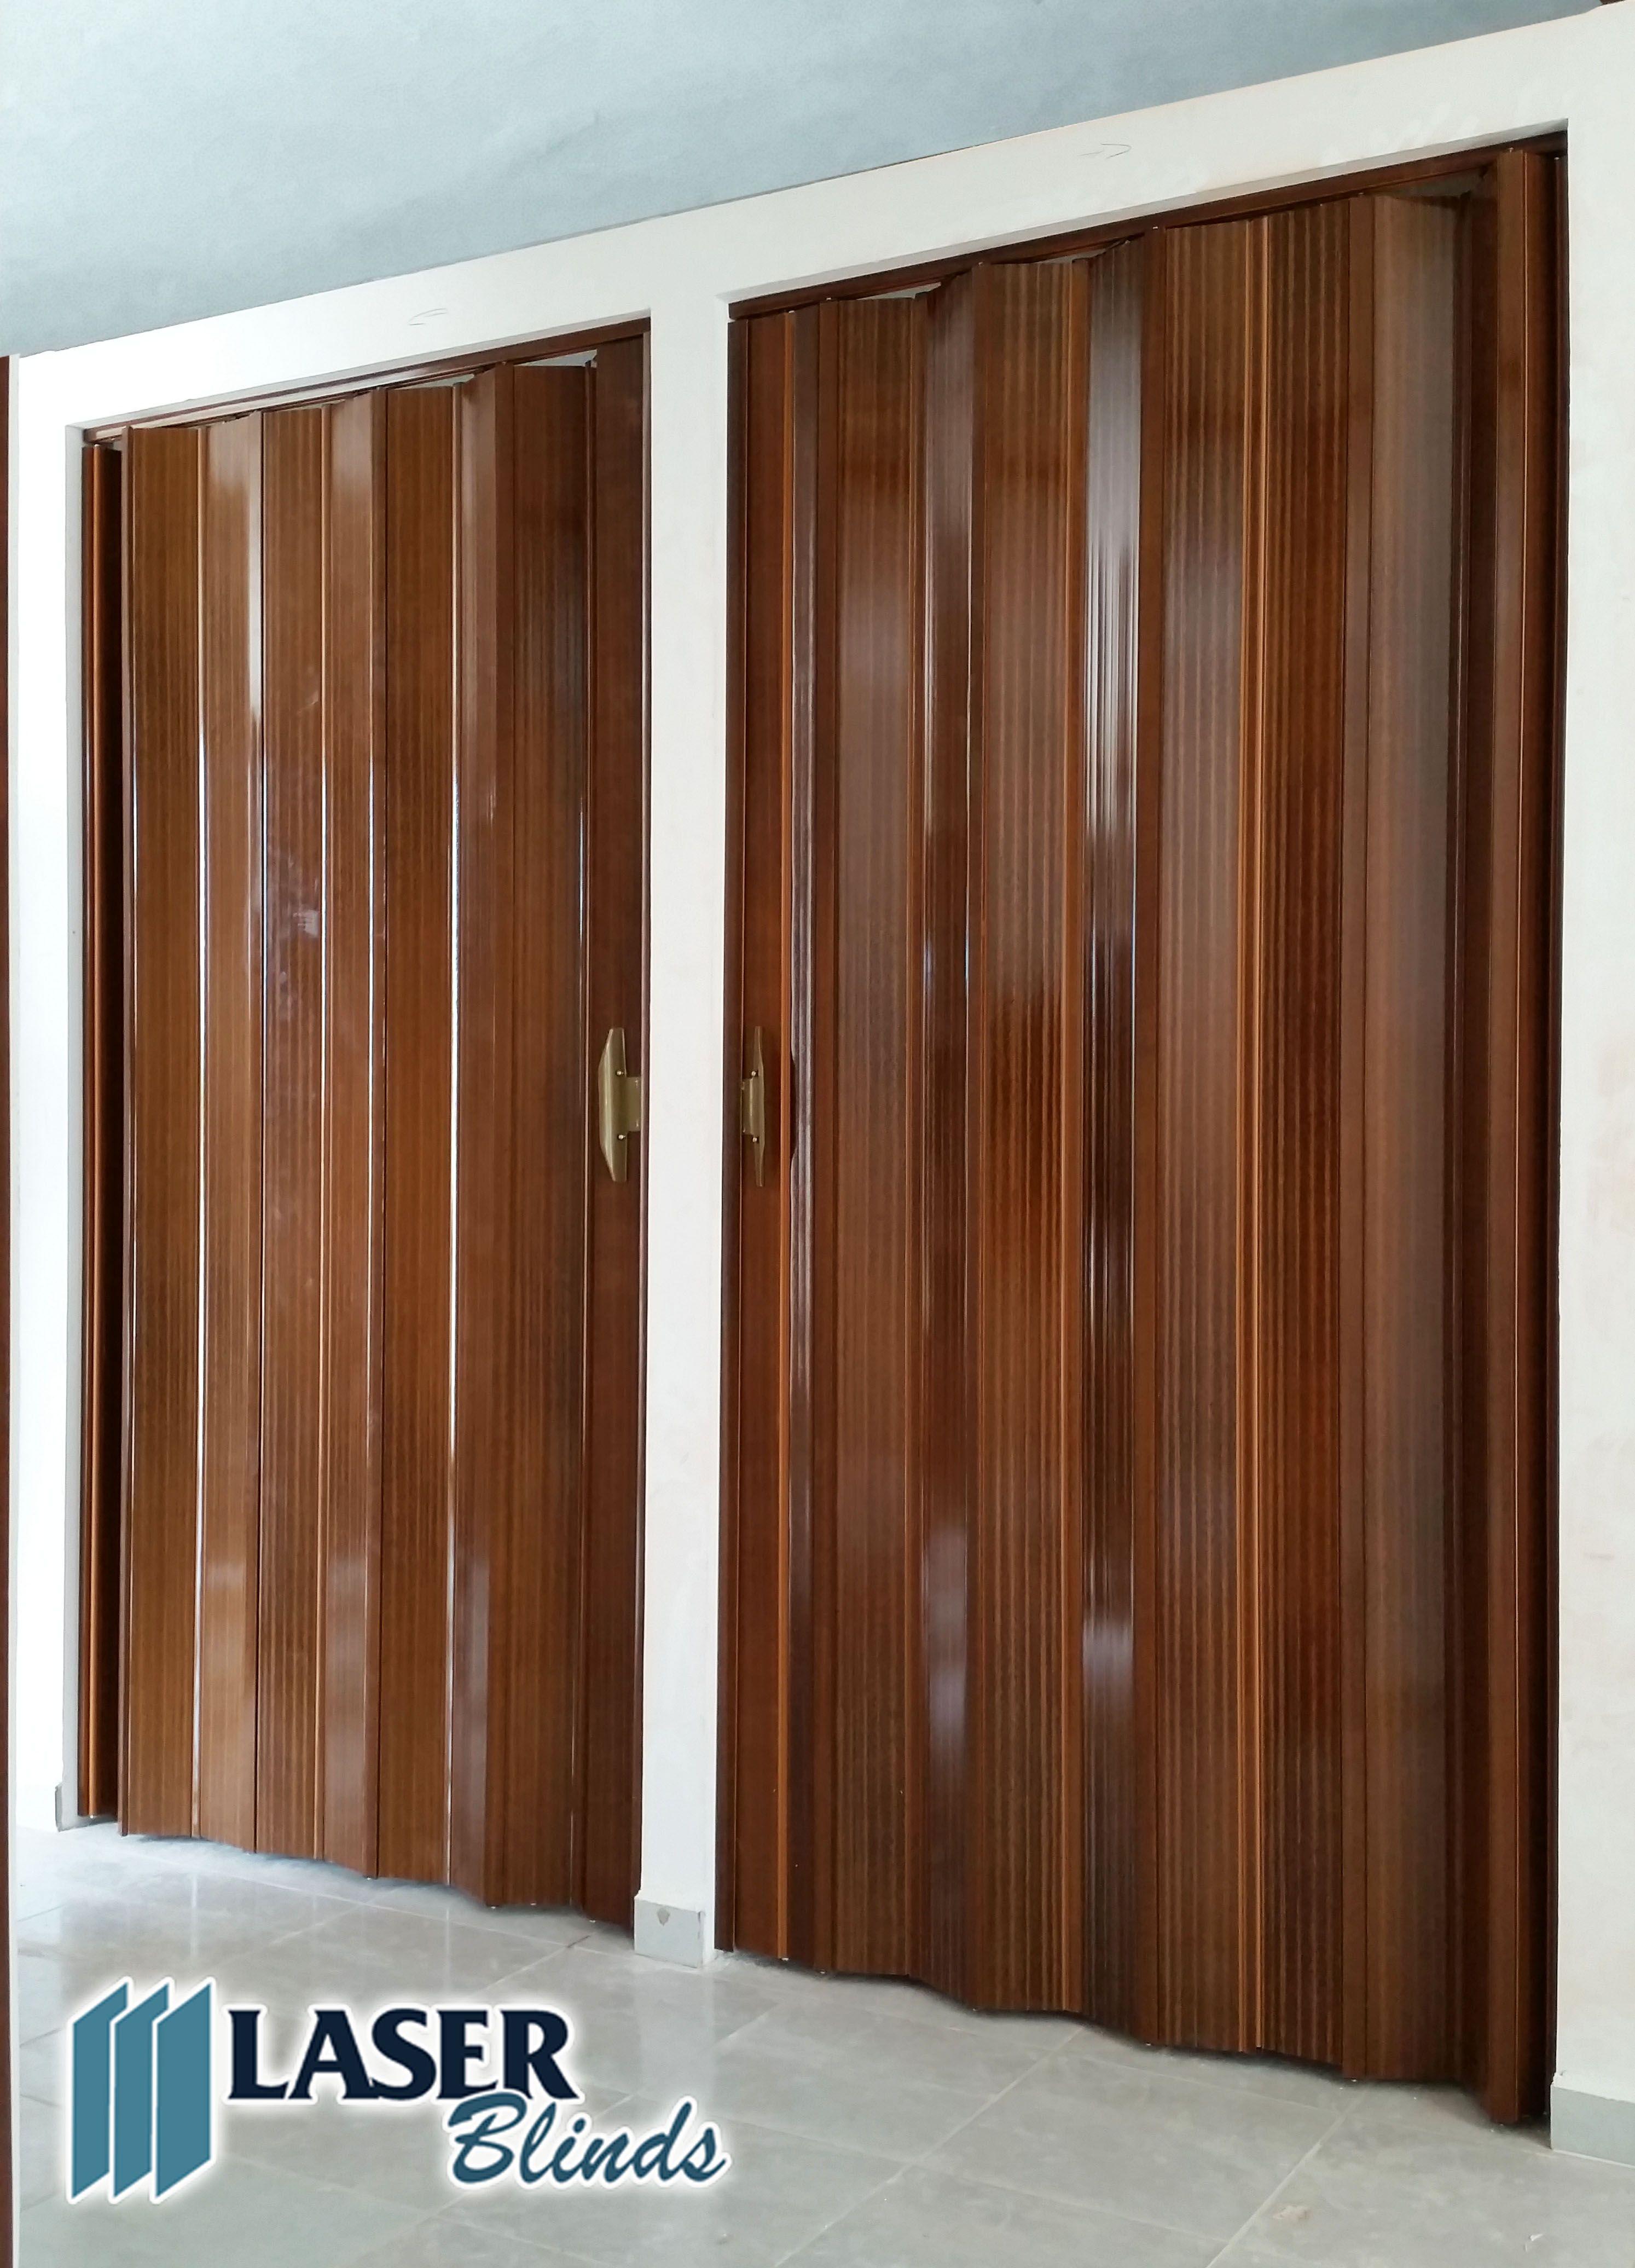 Puertas Plegables de PVC color Caoba www.facebook.com/persianasmx ...